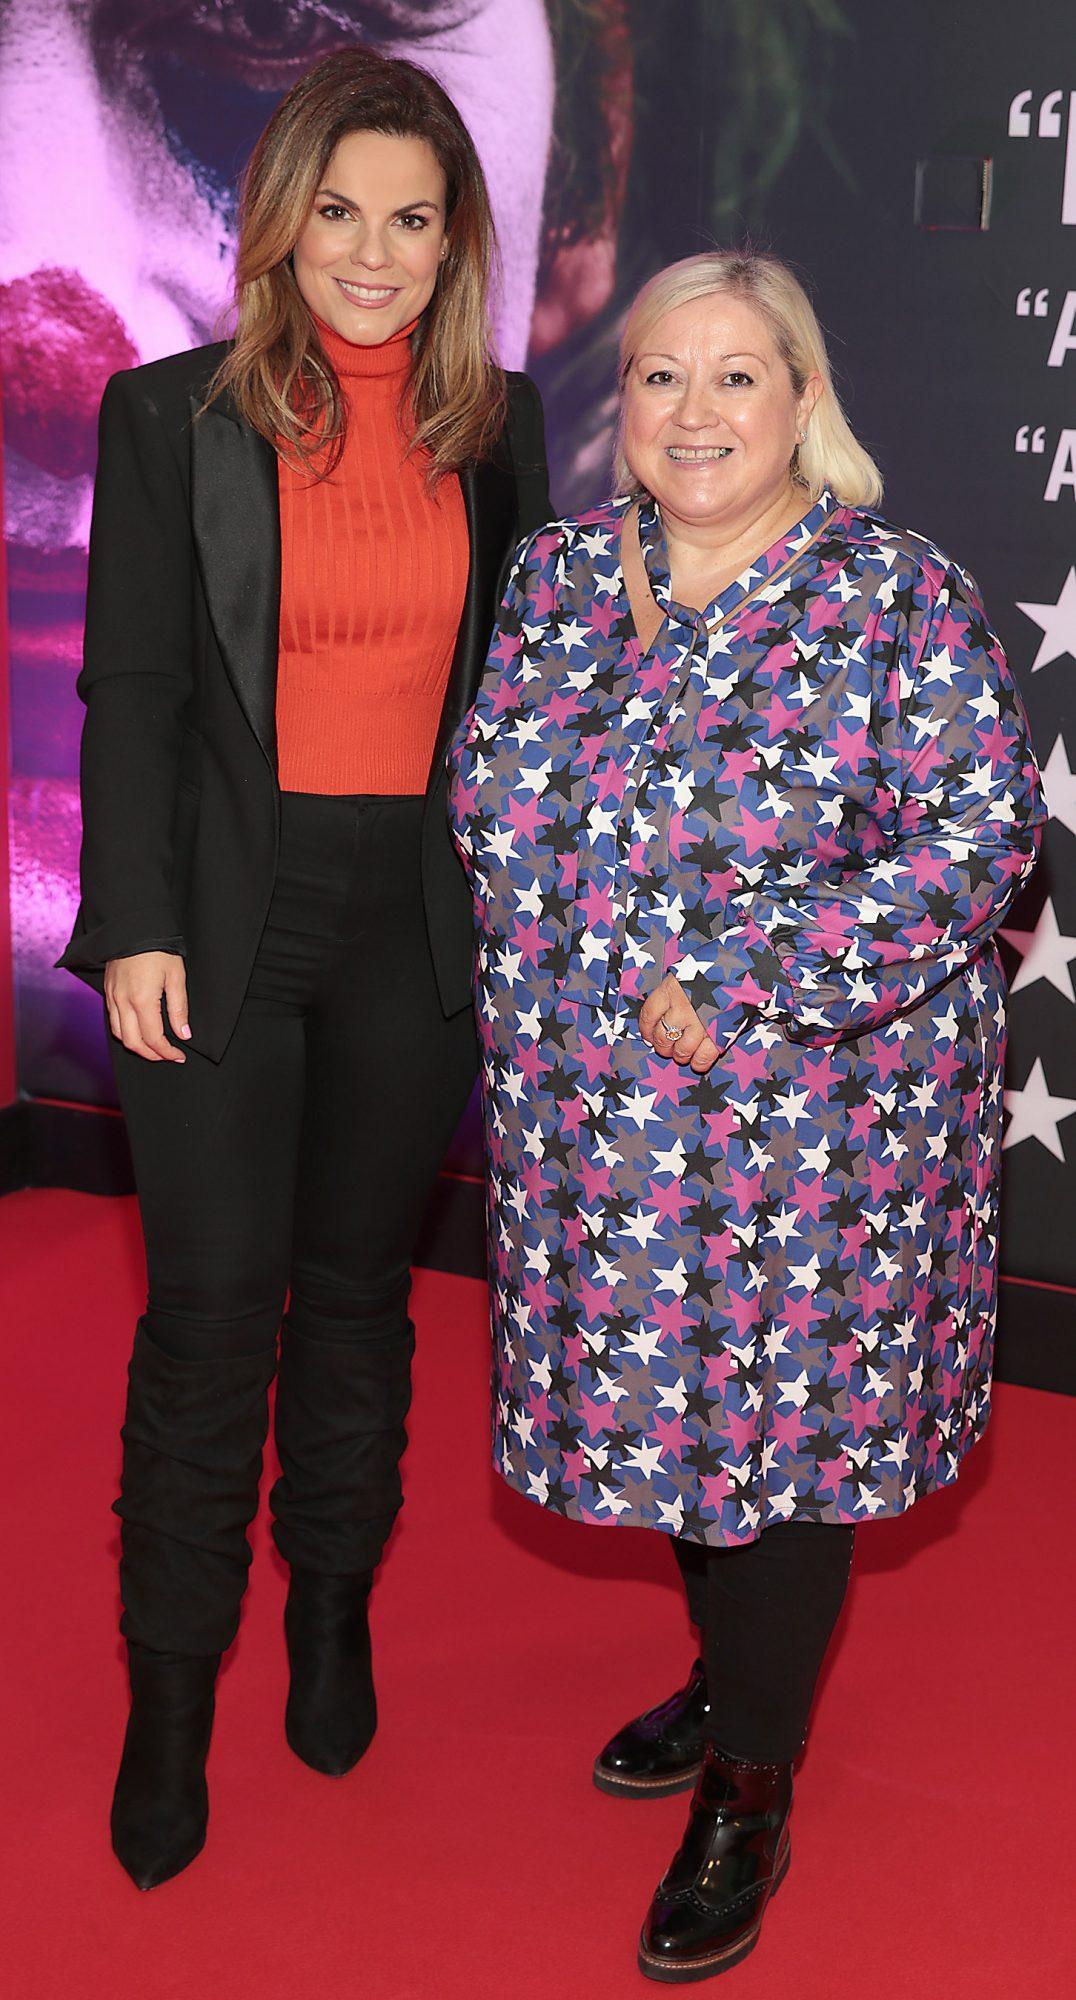 Avila Lipsett and Carmel Breheney  at the Irish Premiere screening of Joker at Cineworld, Dublin. Pic: Brian McEvoy.